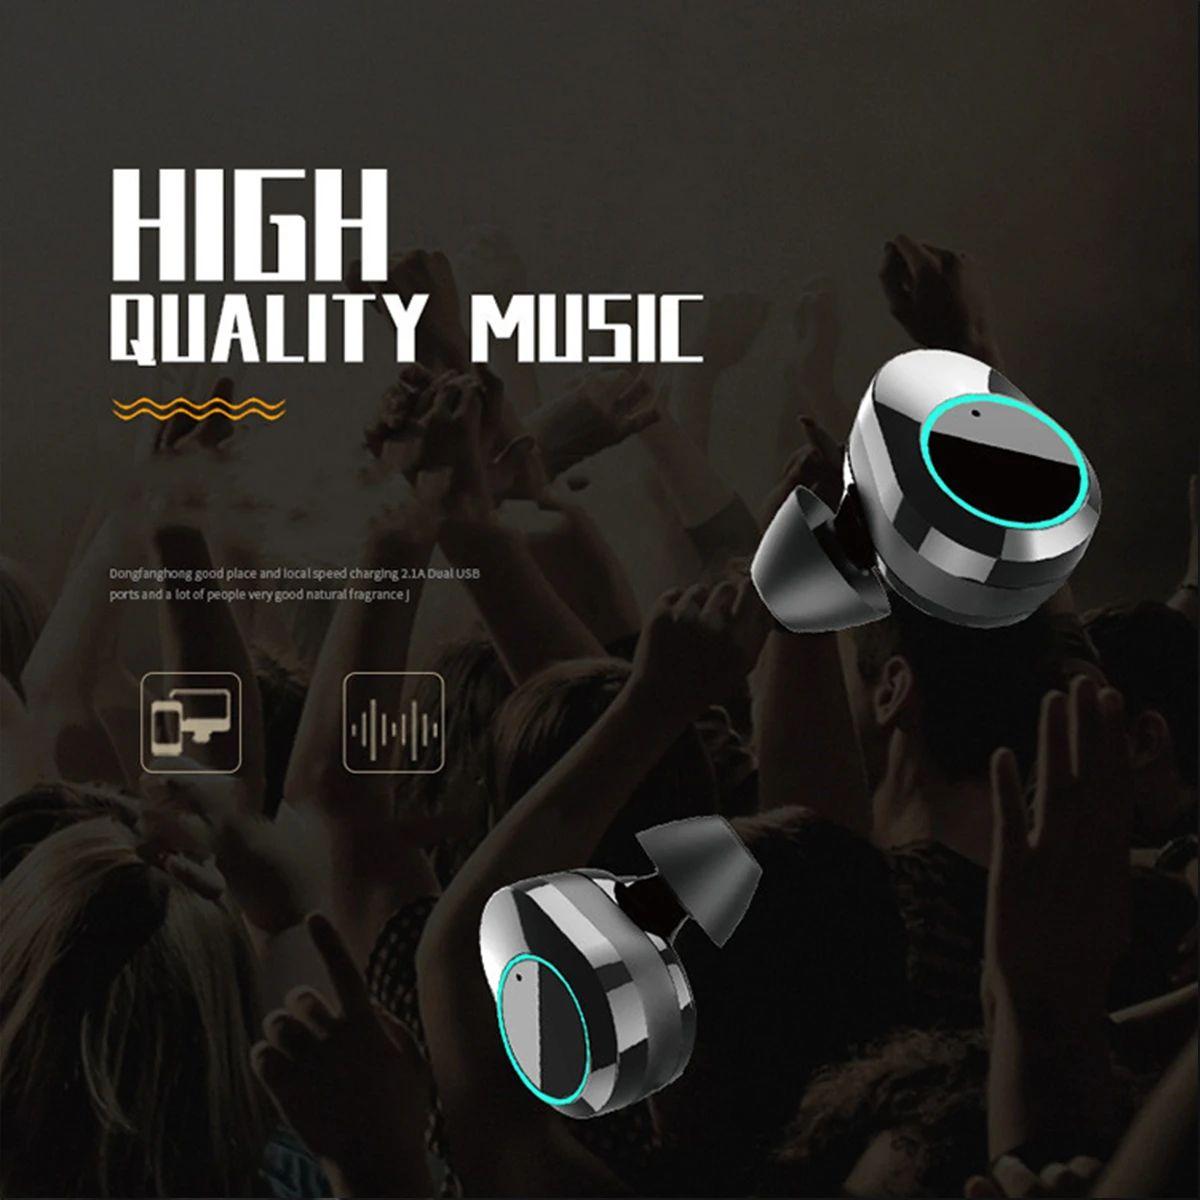 T2C TWS Bluetooth 5.0 earphone hifi stereo type-c charging case wholesale china 1 (7)